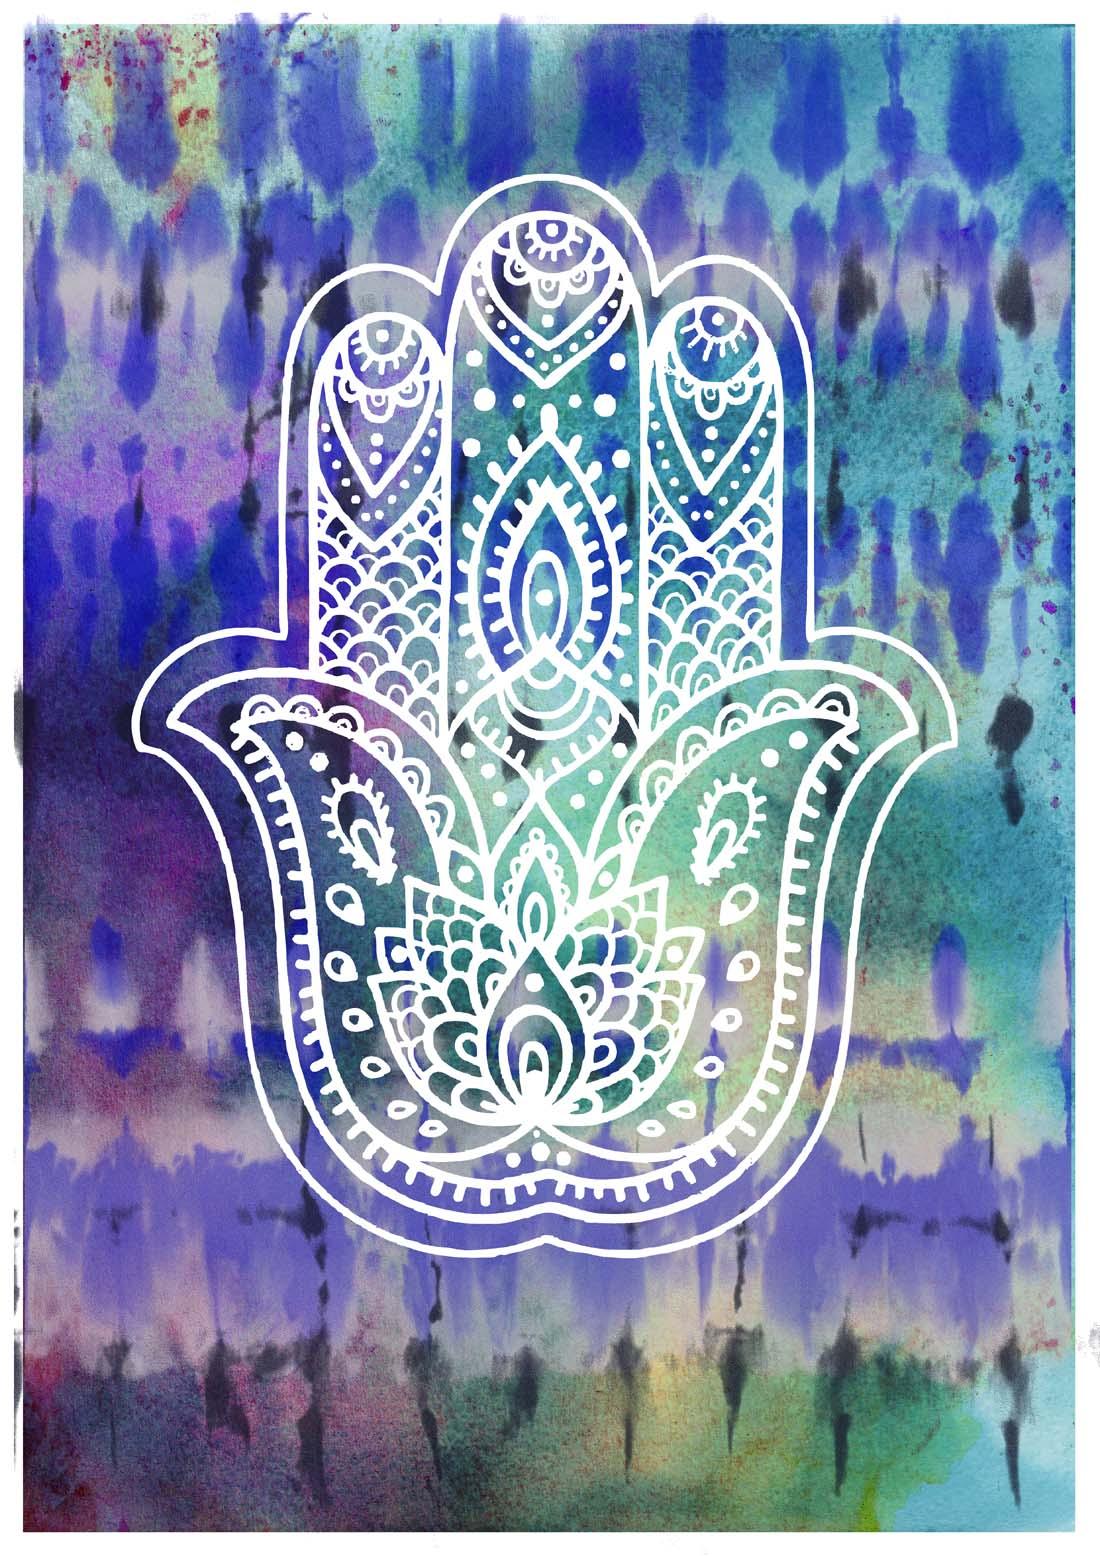 Hamsa-Hand-hippie-style-Wall-art-dorm-decor-poster-print-Karma-religious%E2%80%A6-wallpaper-wp5405512